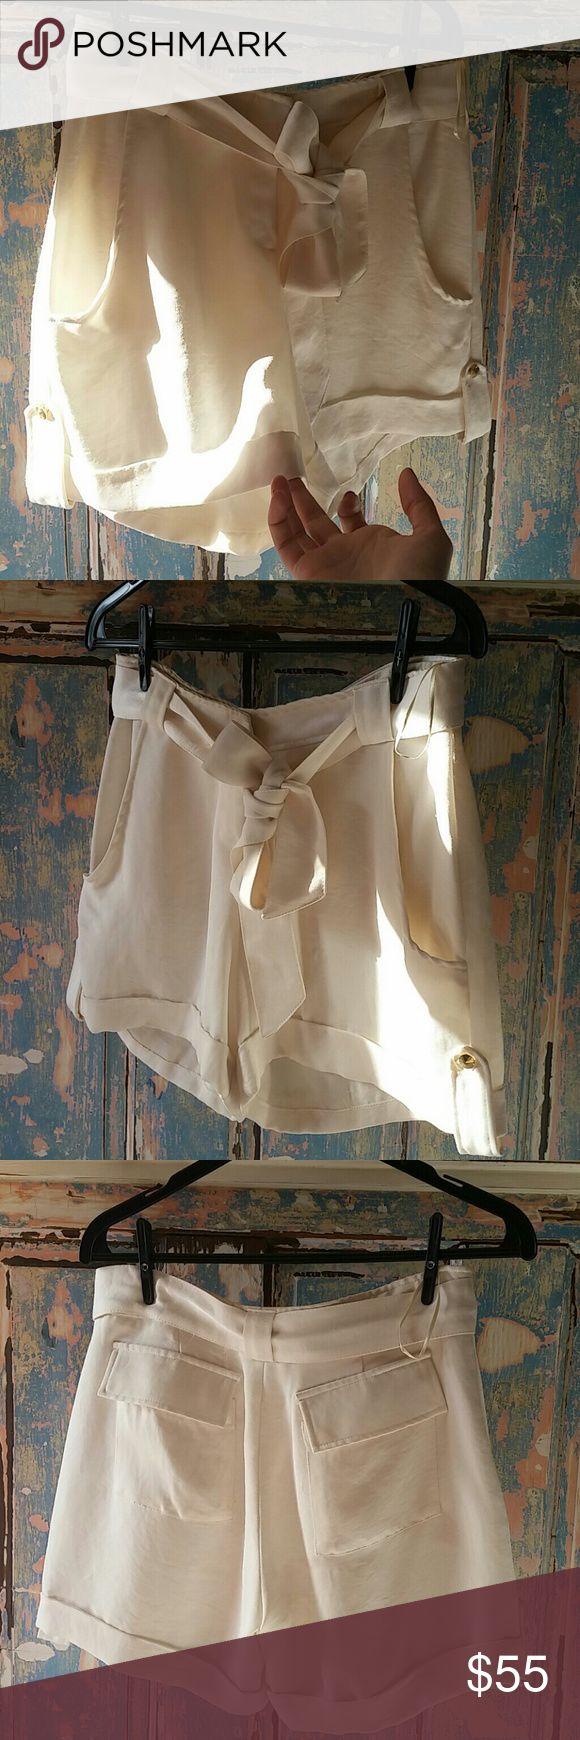 Amazing elegant shorts From Rio de Janeiro classy good finished fits small and medium Rio de janeiro Shorts